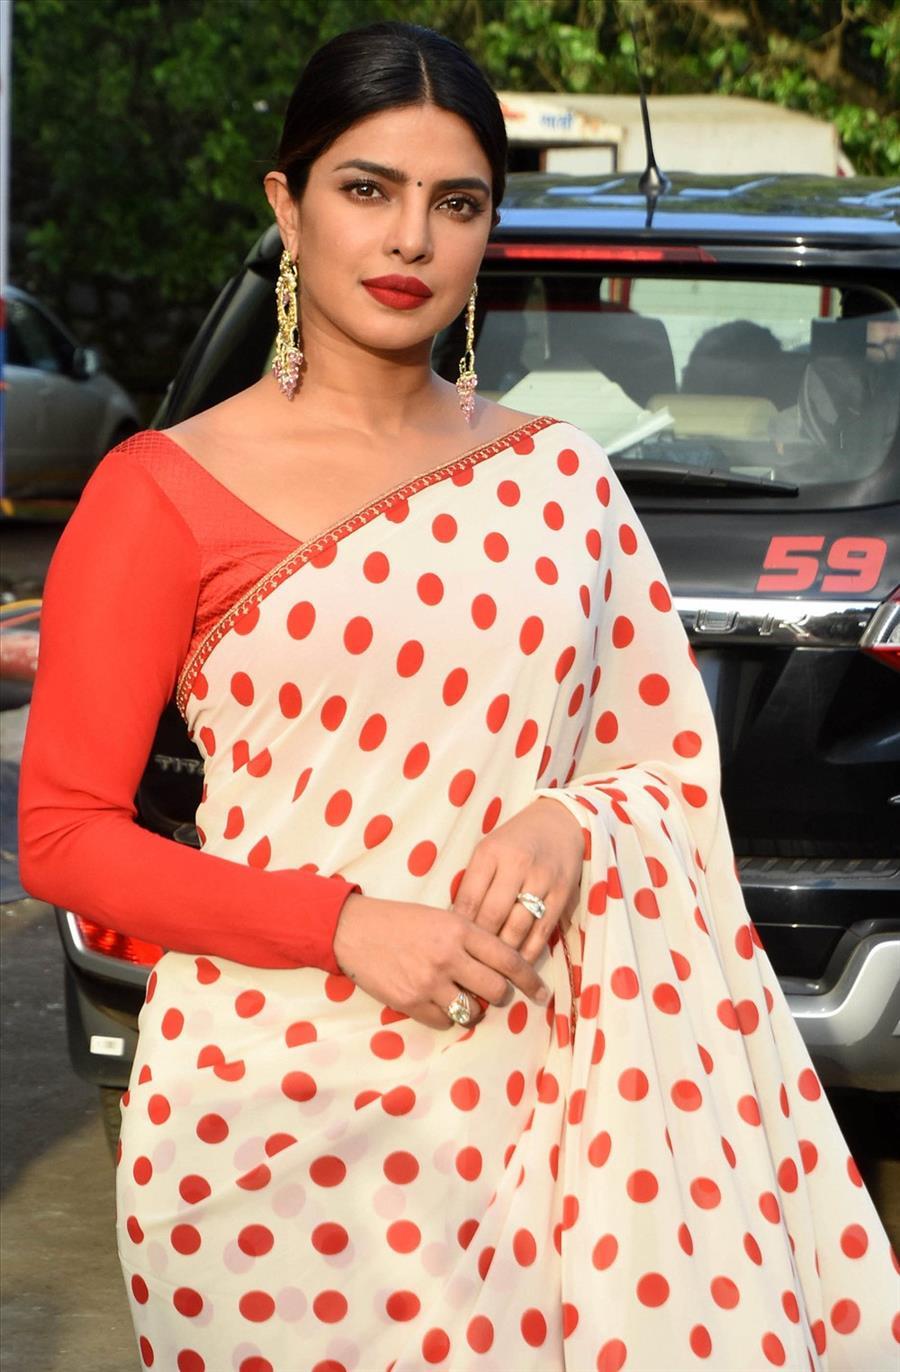 Indian Model Priyanka Chopra In Traditional Red Saree